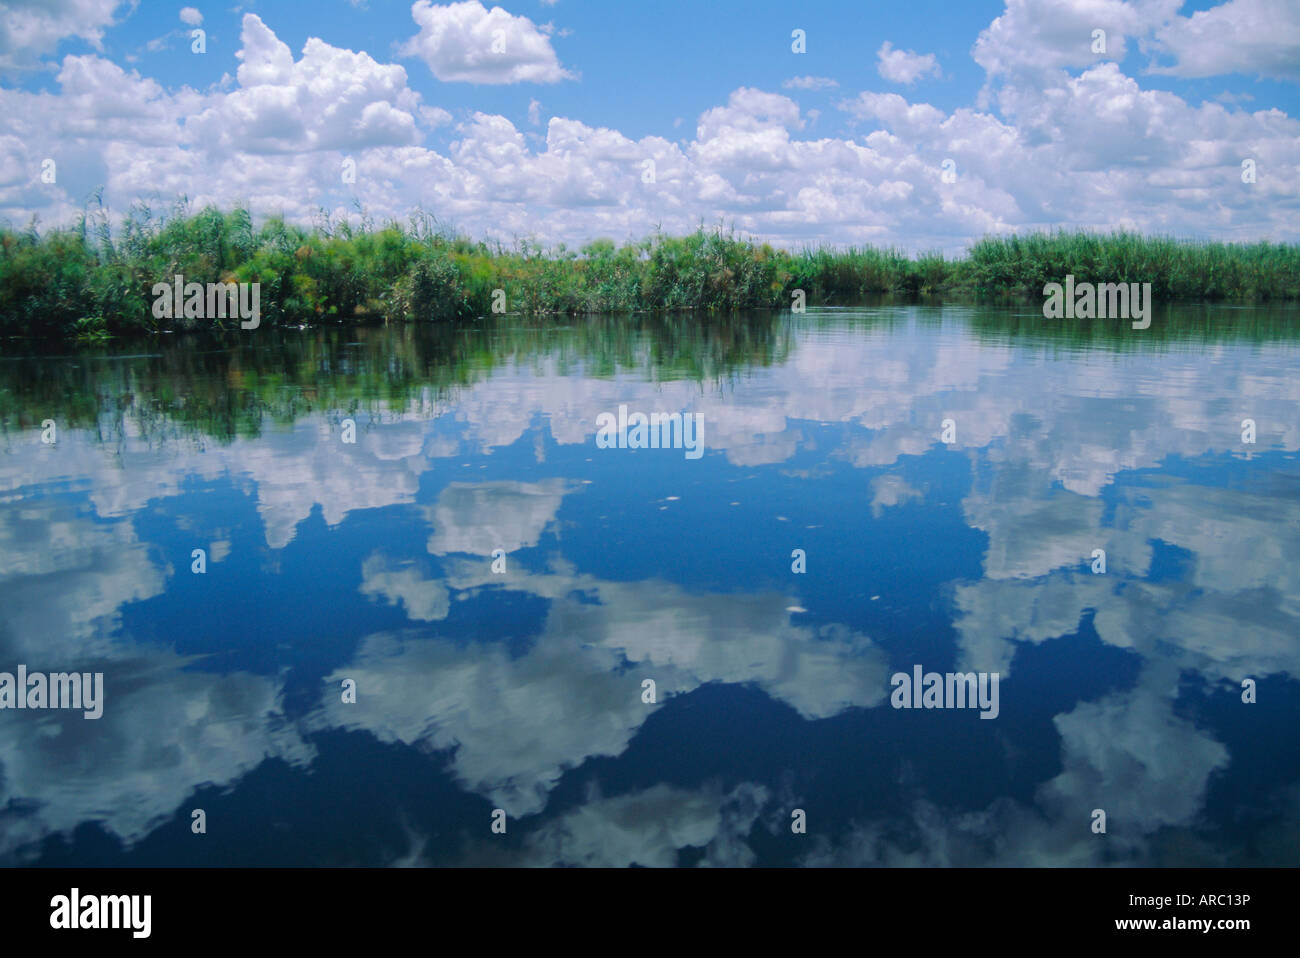 Okavango Delta, Botswana, Africa - Stock Image